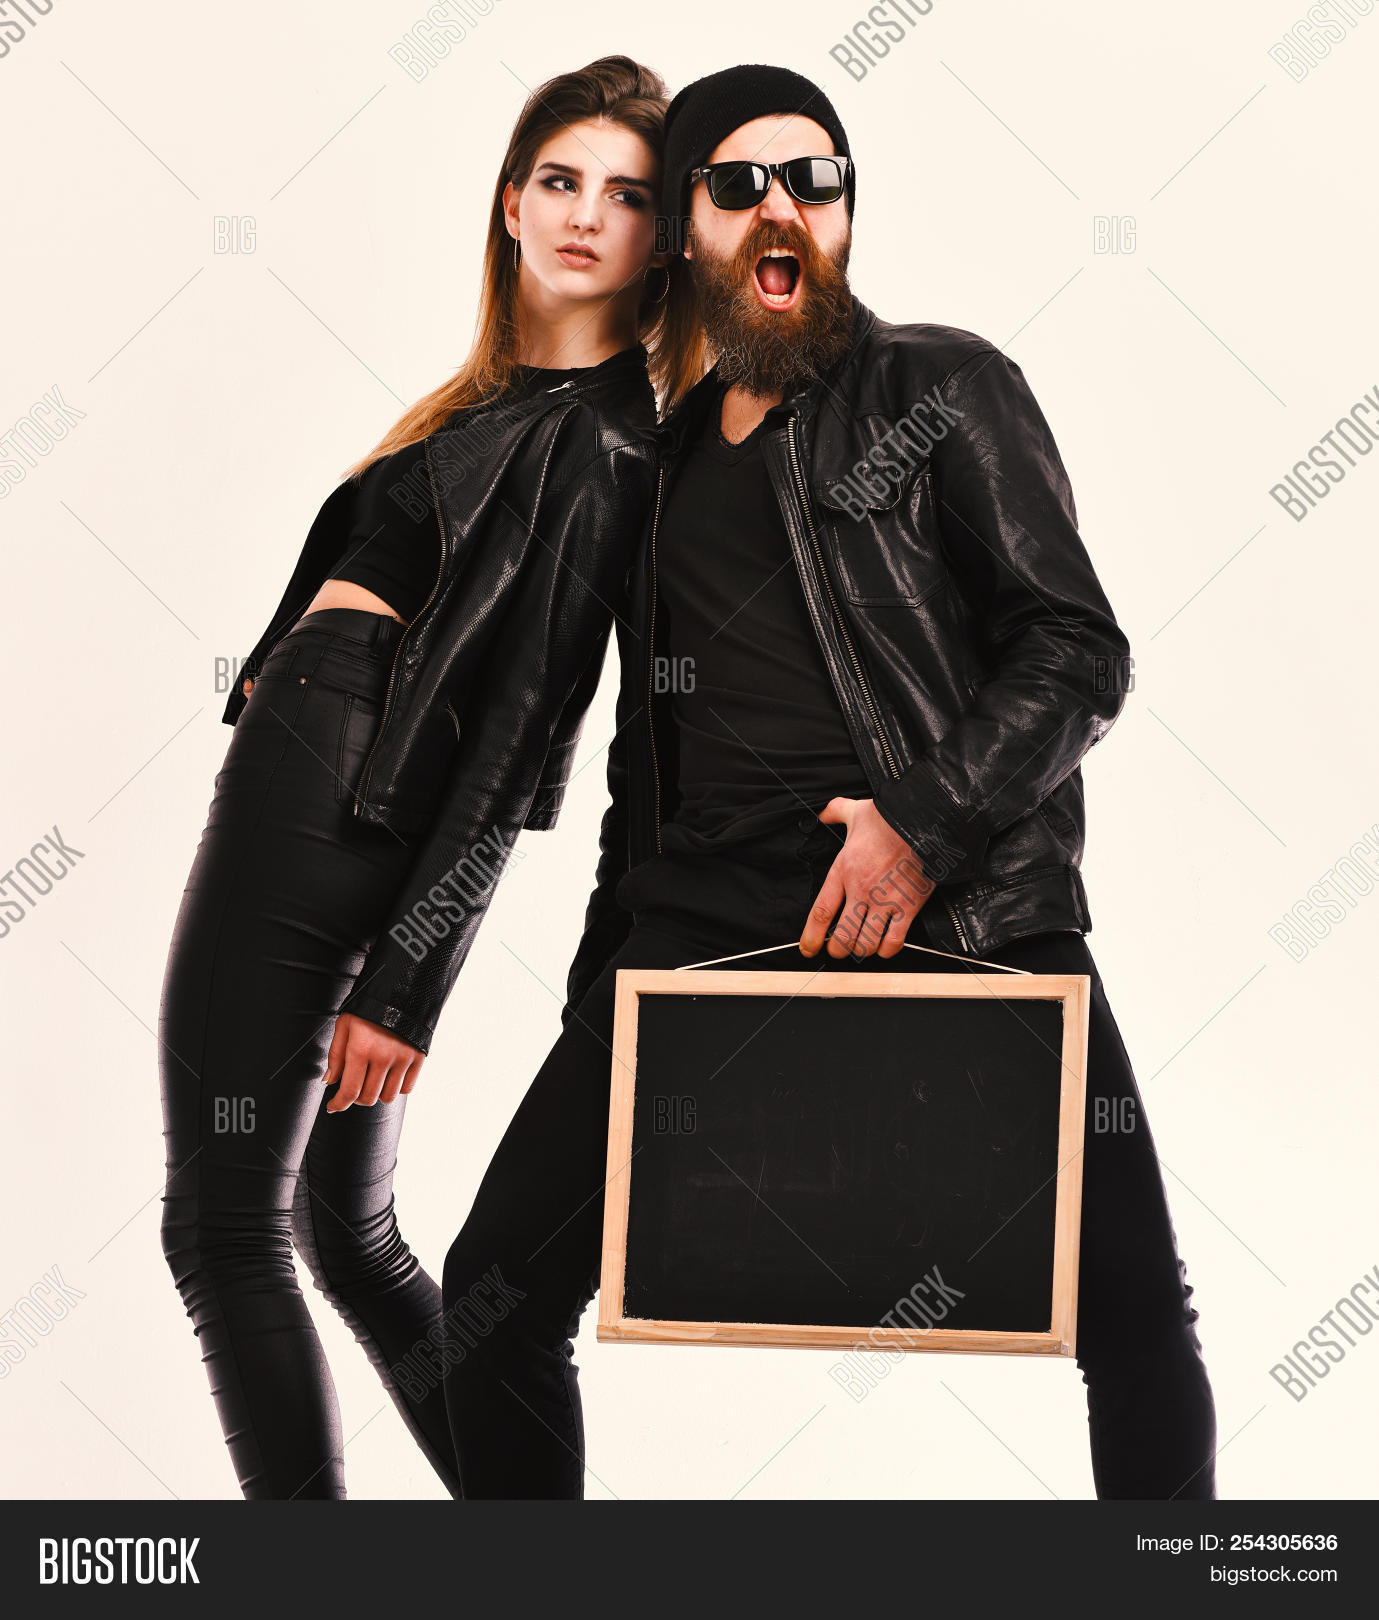 74db761f4 Couple Love Brutal Image & Photo (Free Trial)   Bigstock